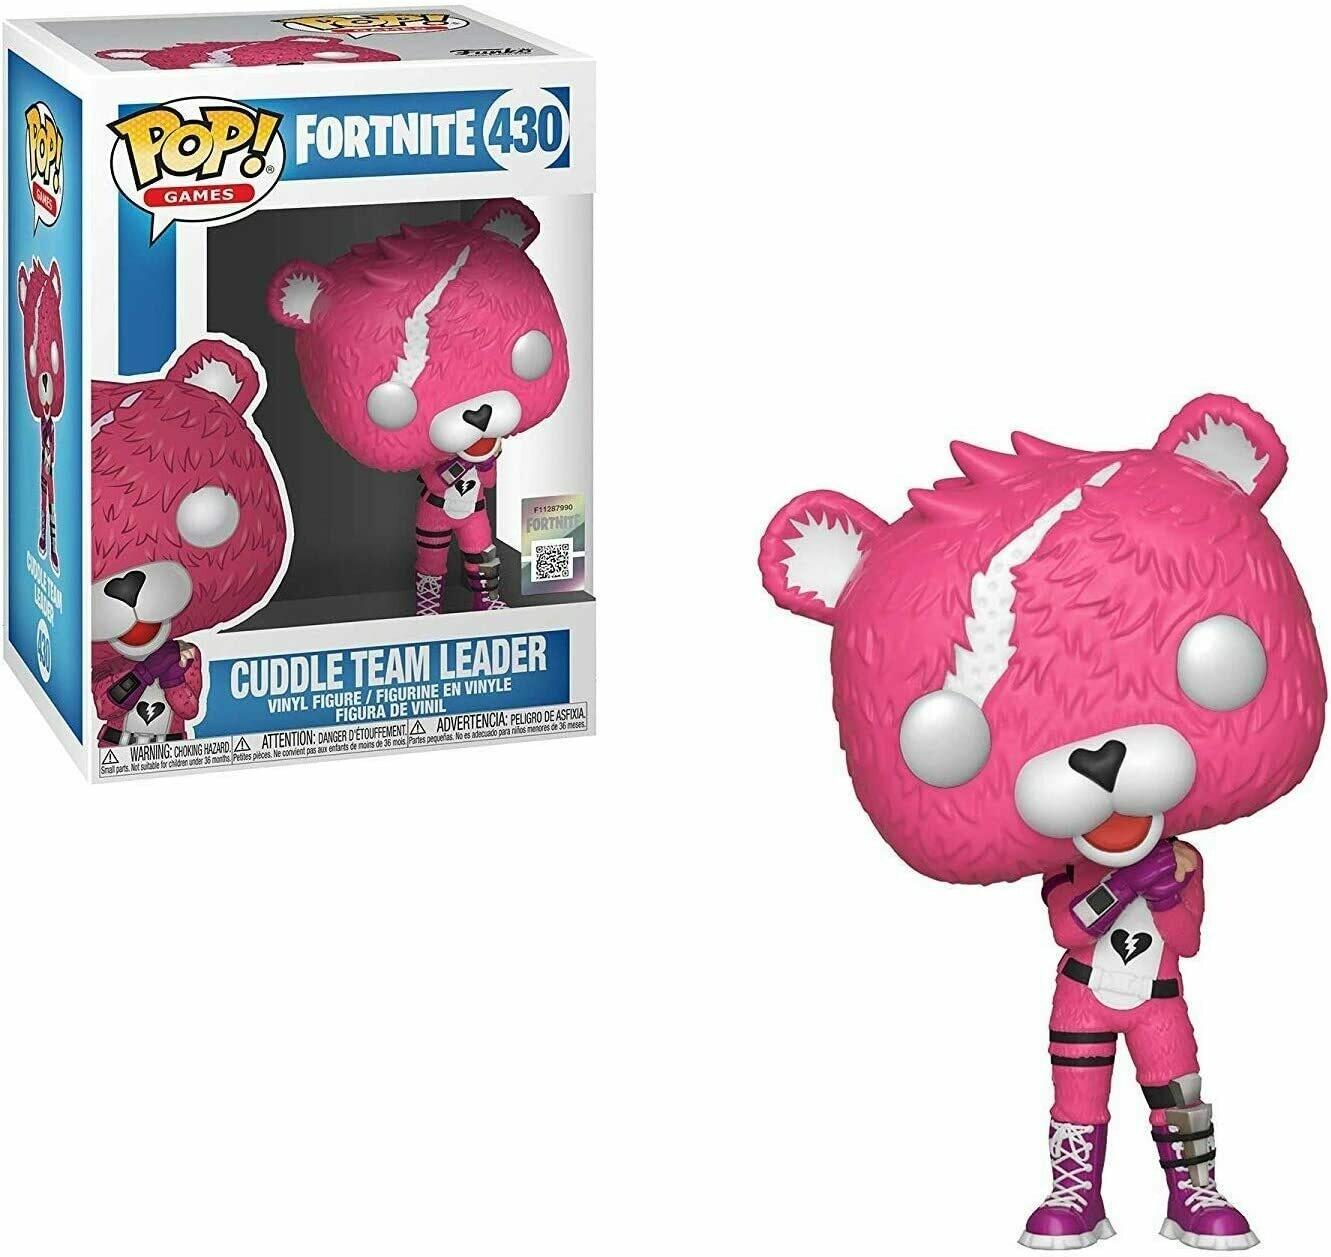 Funko Pop! Fortnite Cuddle Team Leader